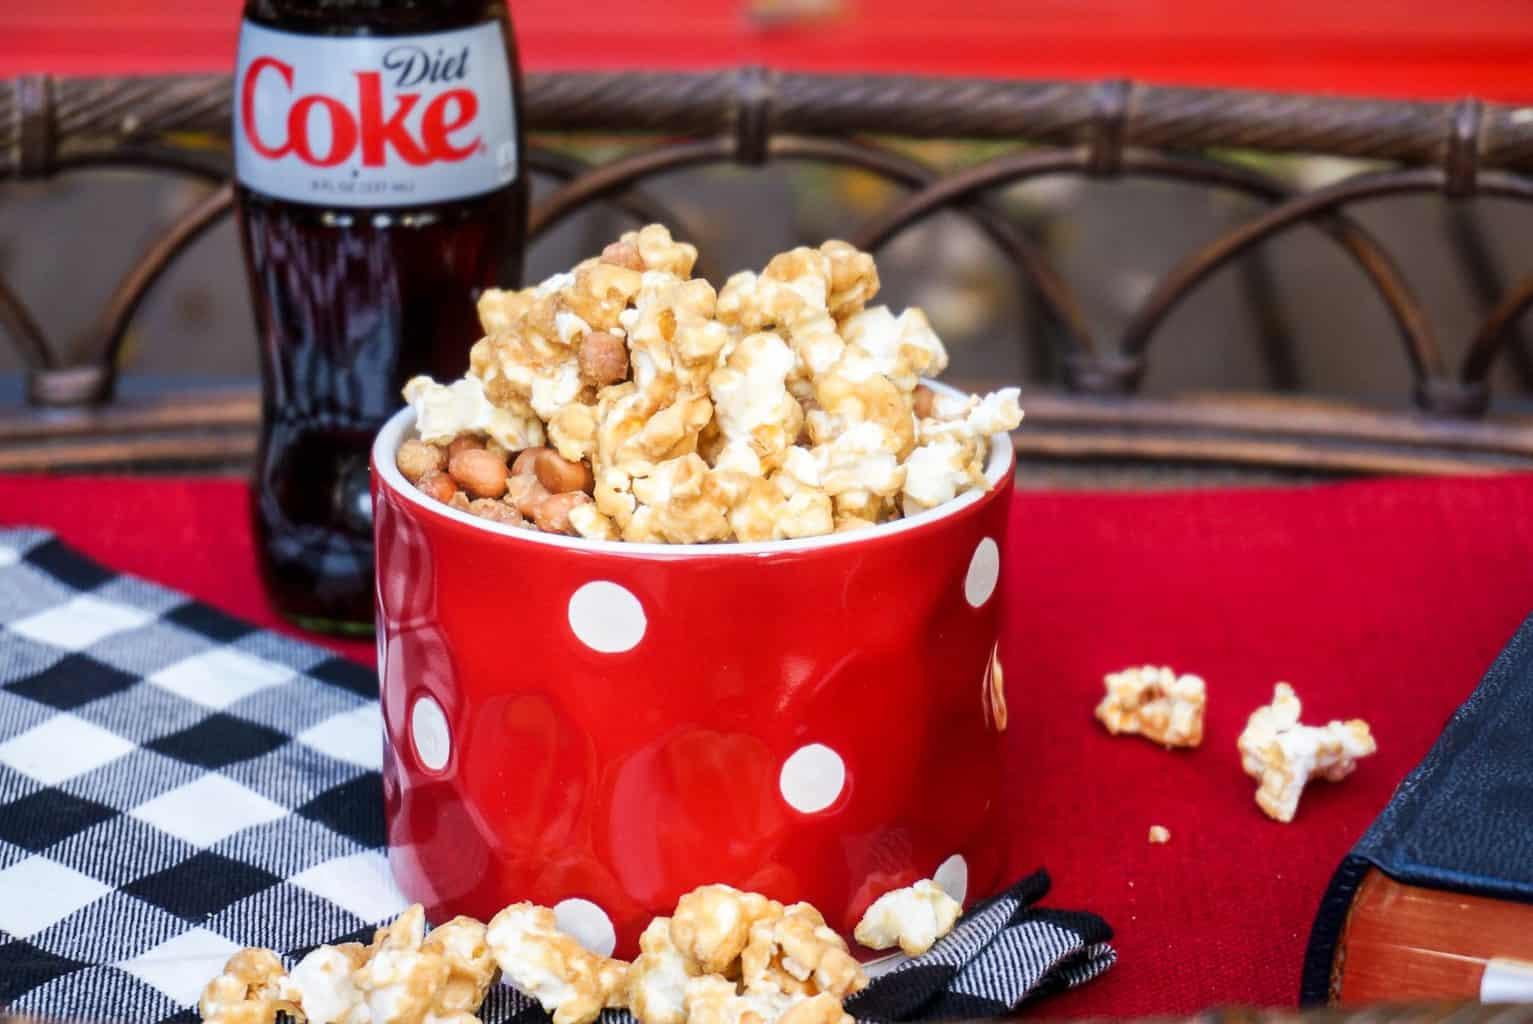 Cracker Jacks Caramel Popcorn with Peanuts